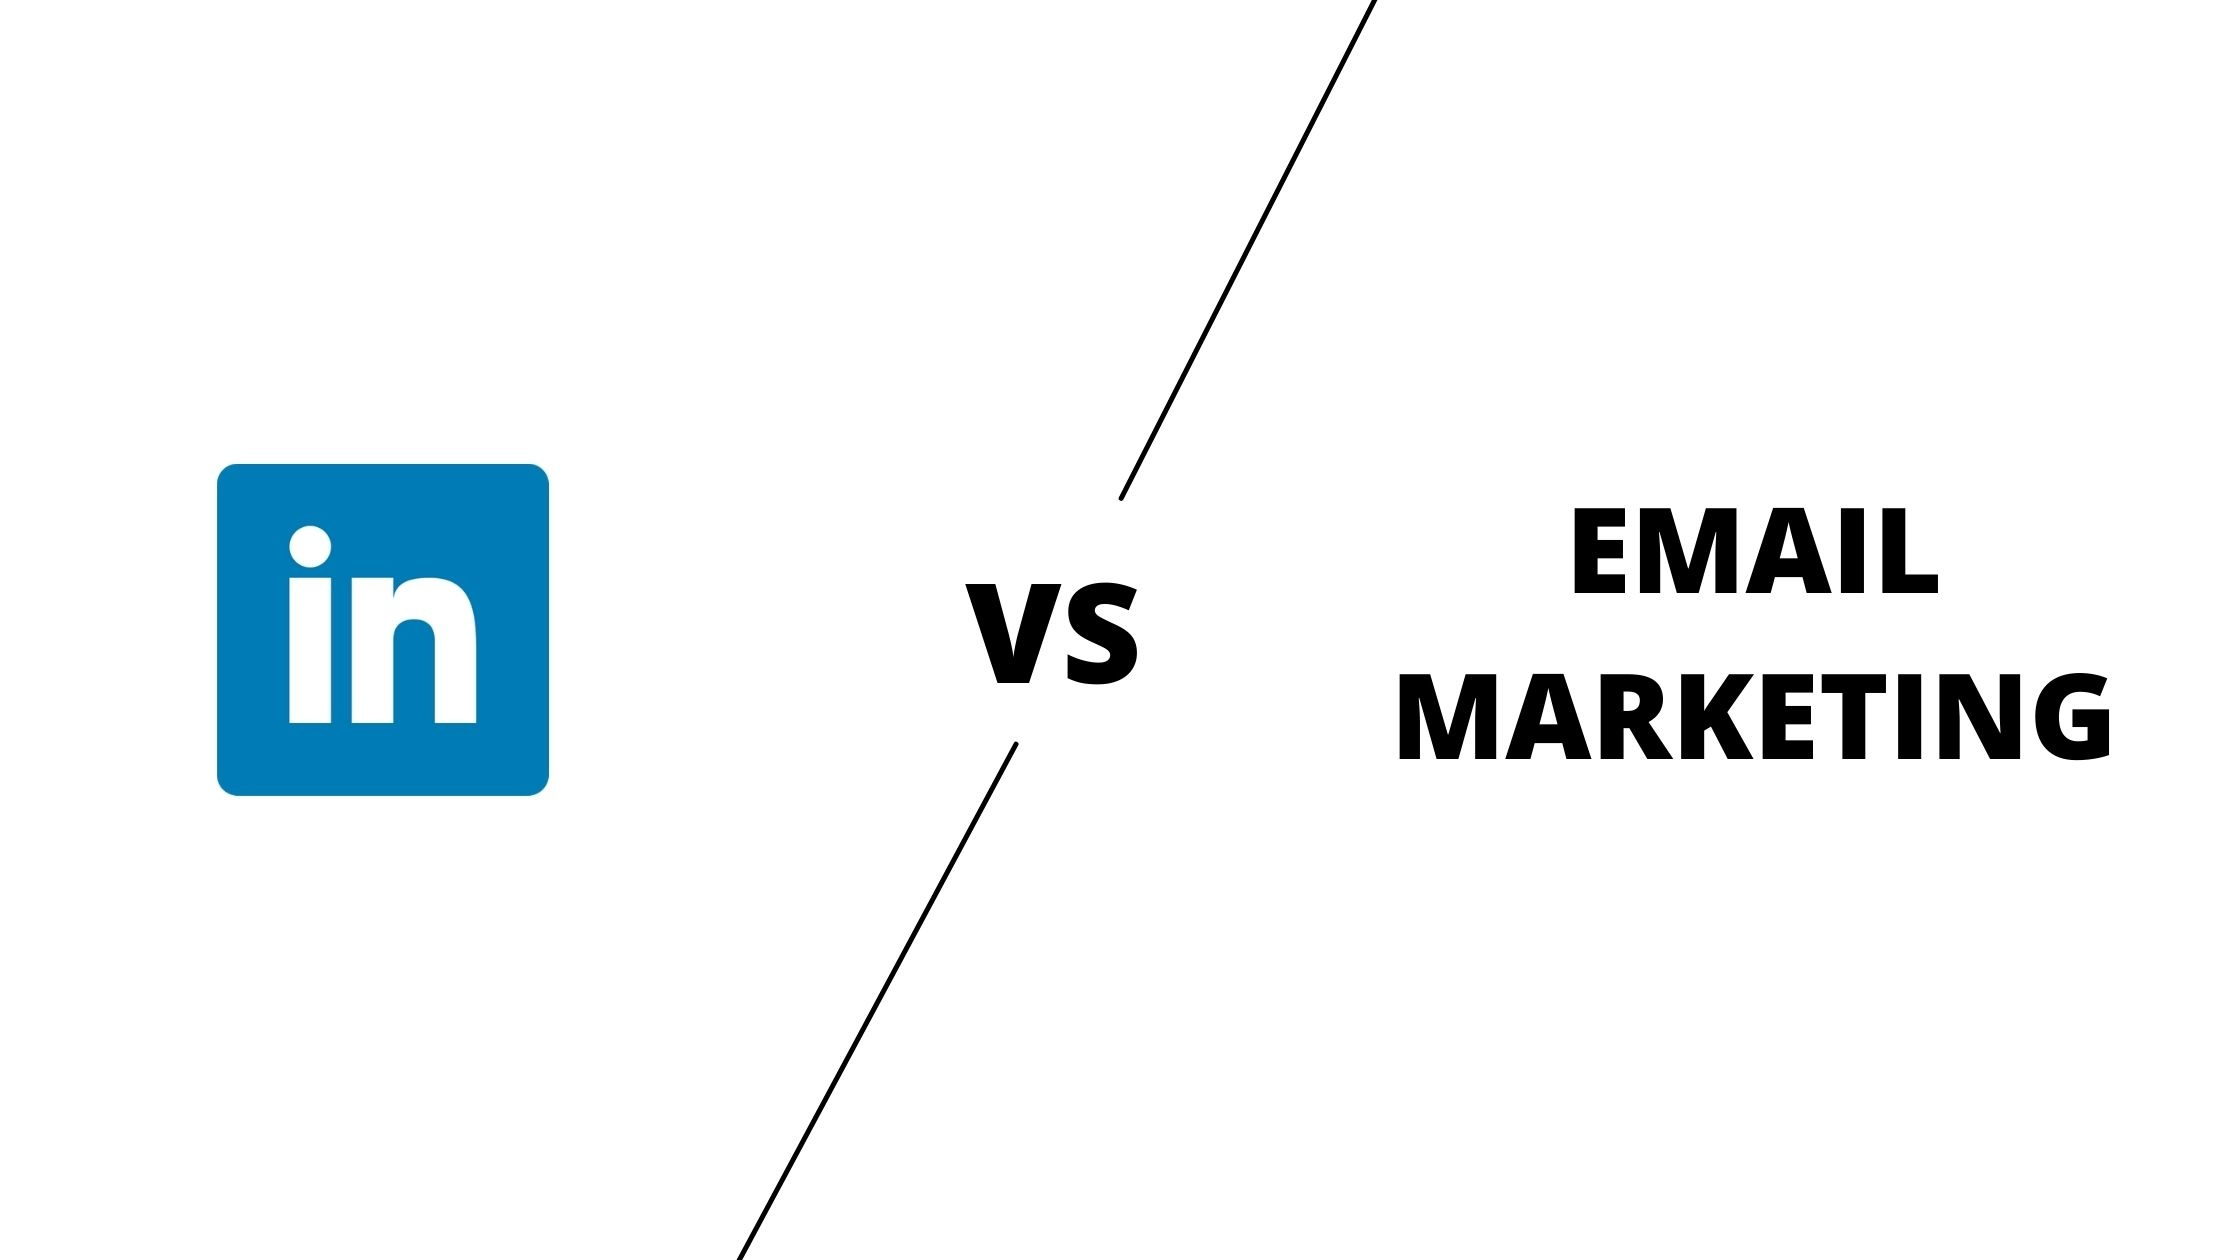 Email Marketing Vs LinkedIn